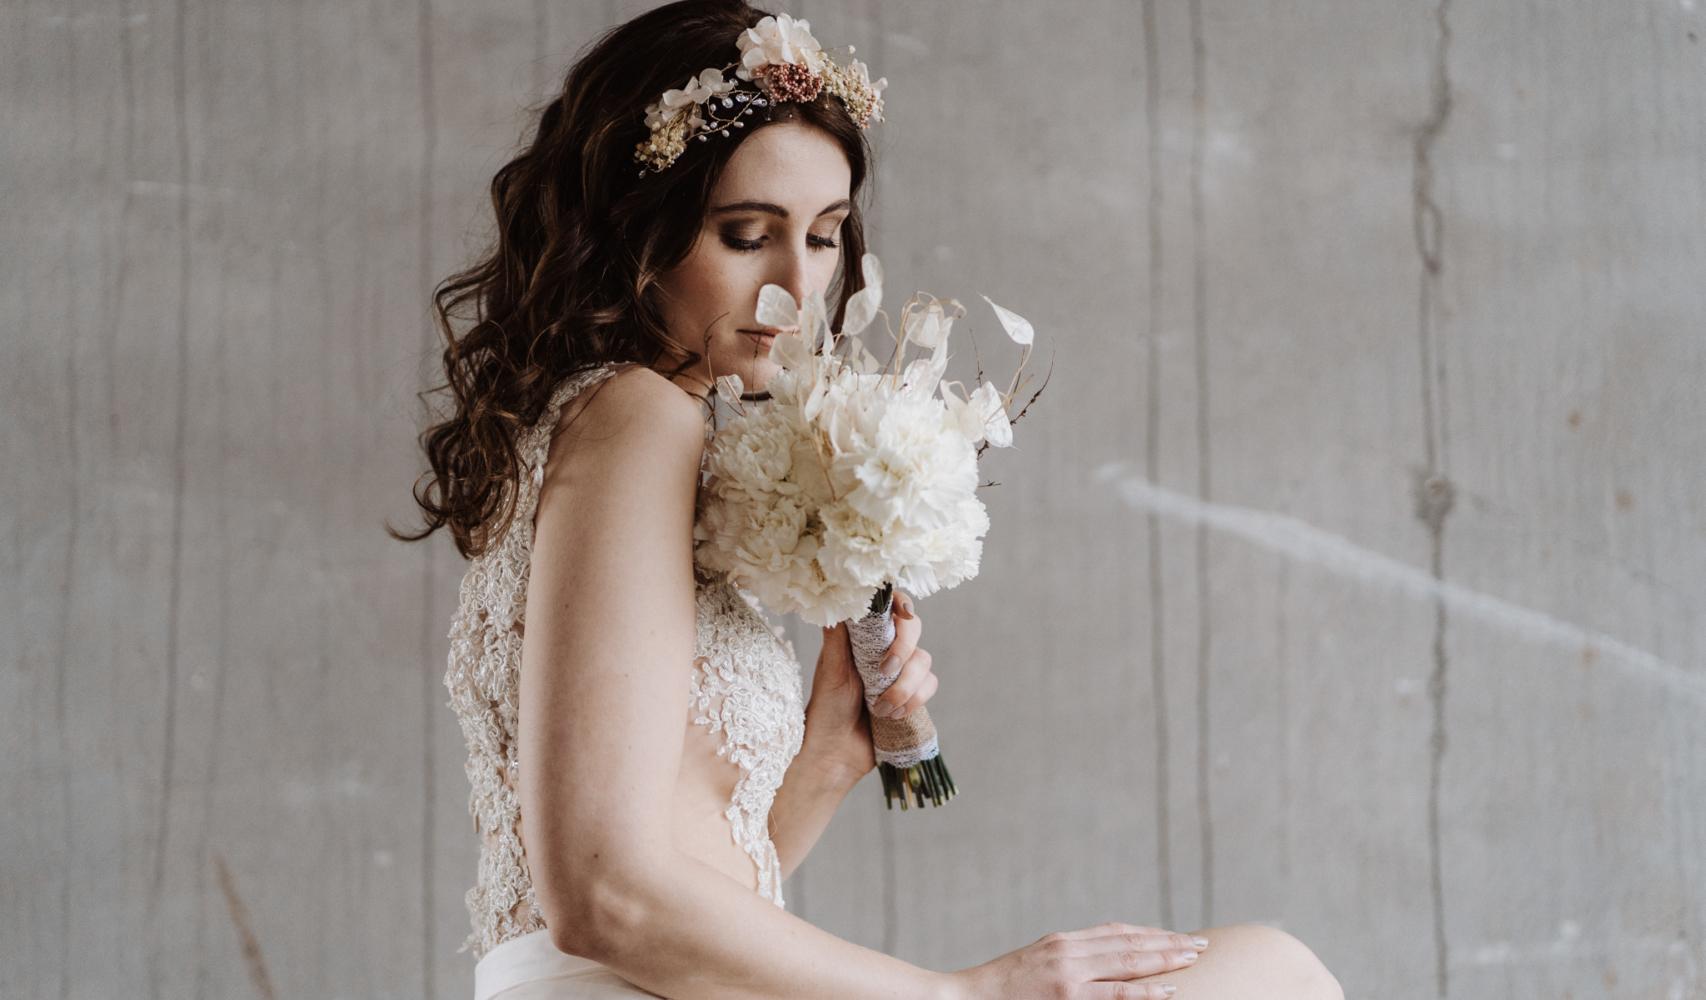 Bridal Editorial_ThuTrinh Photography 3